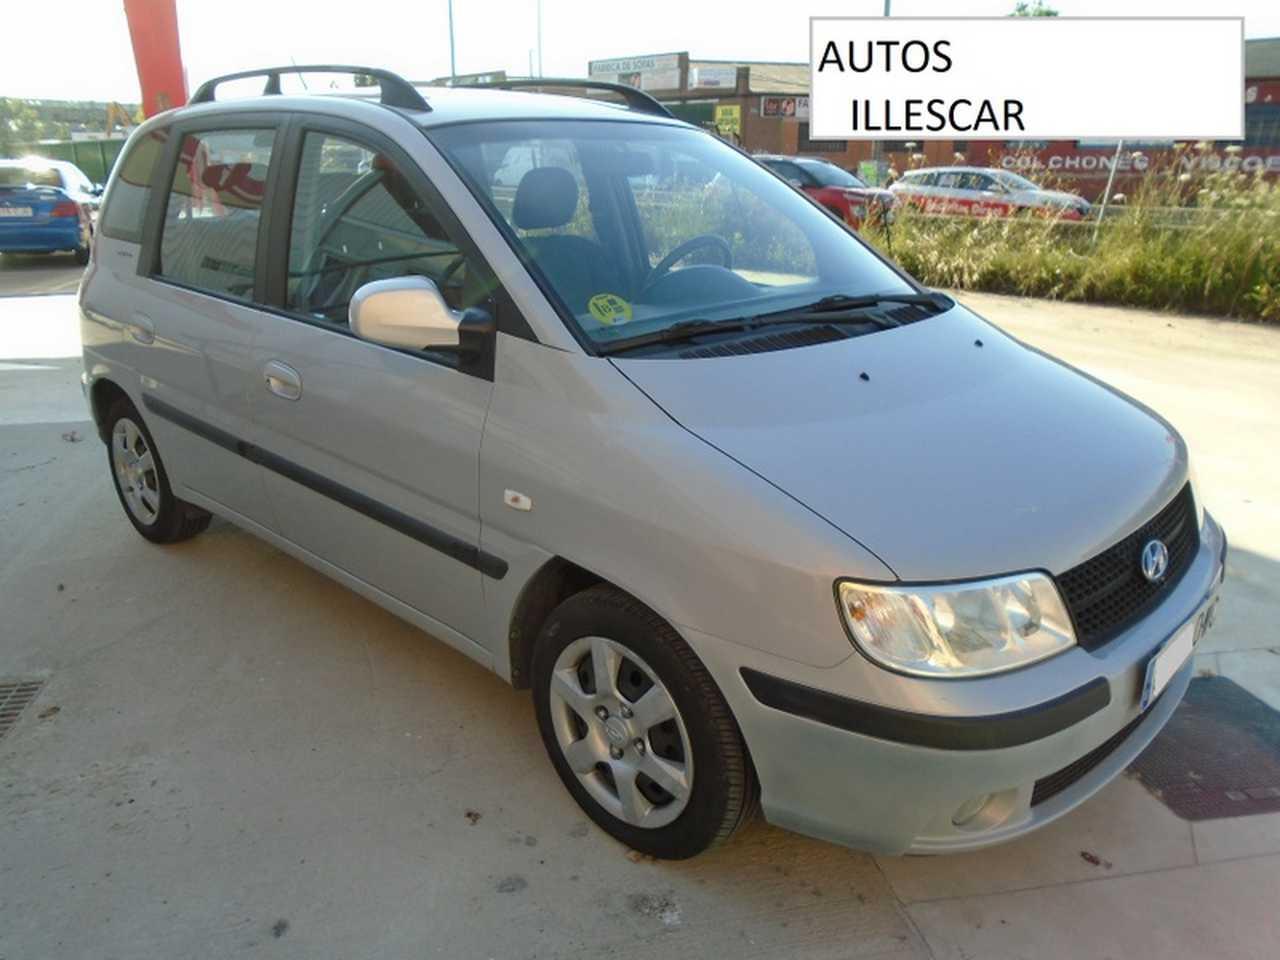 Hyundai Matrix 1.5 CRDI  110 CV MUY CUIDADO  - Foto 1